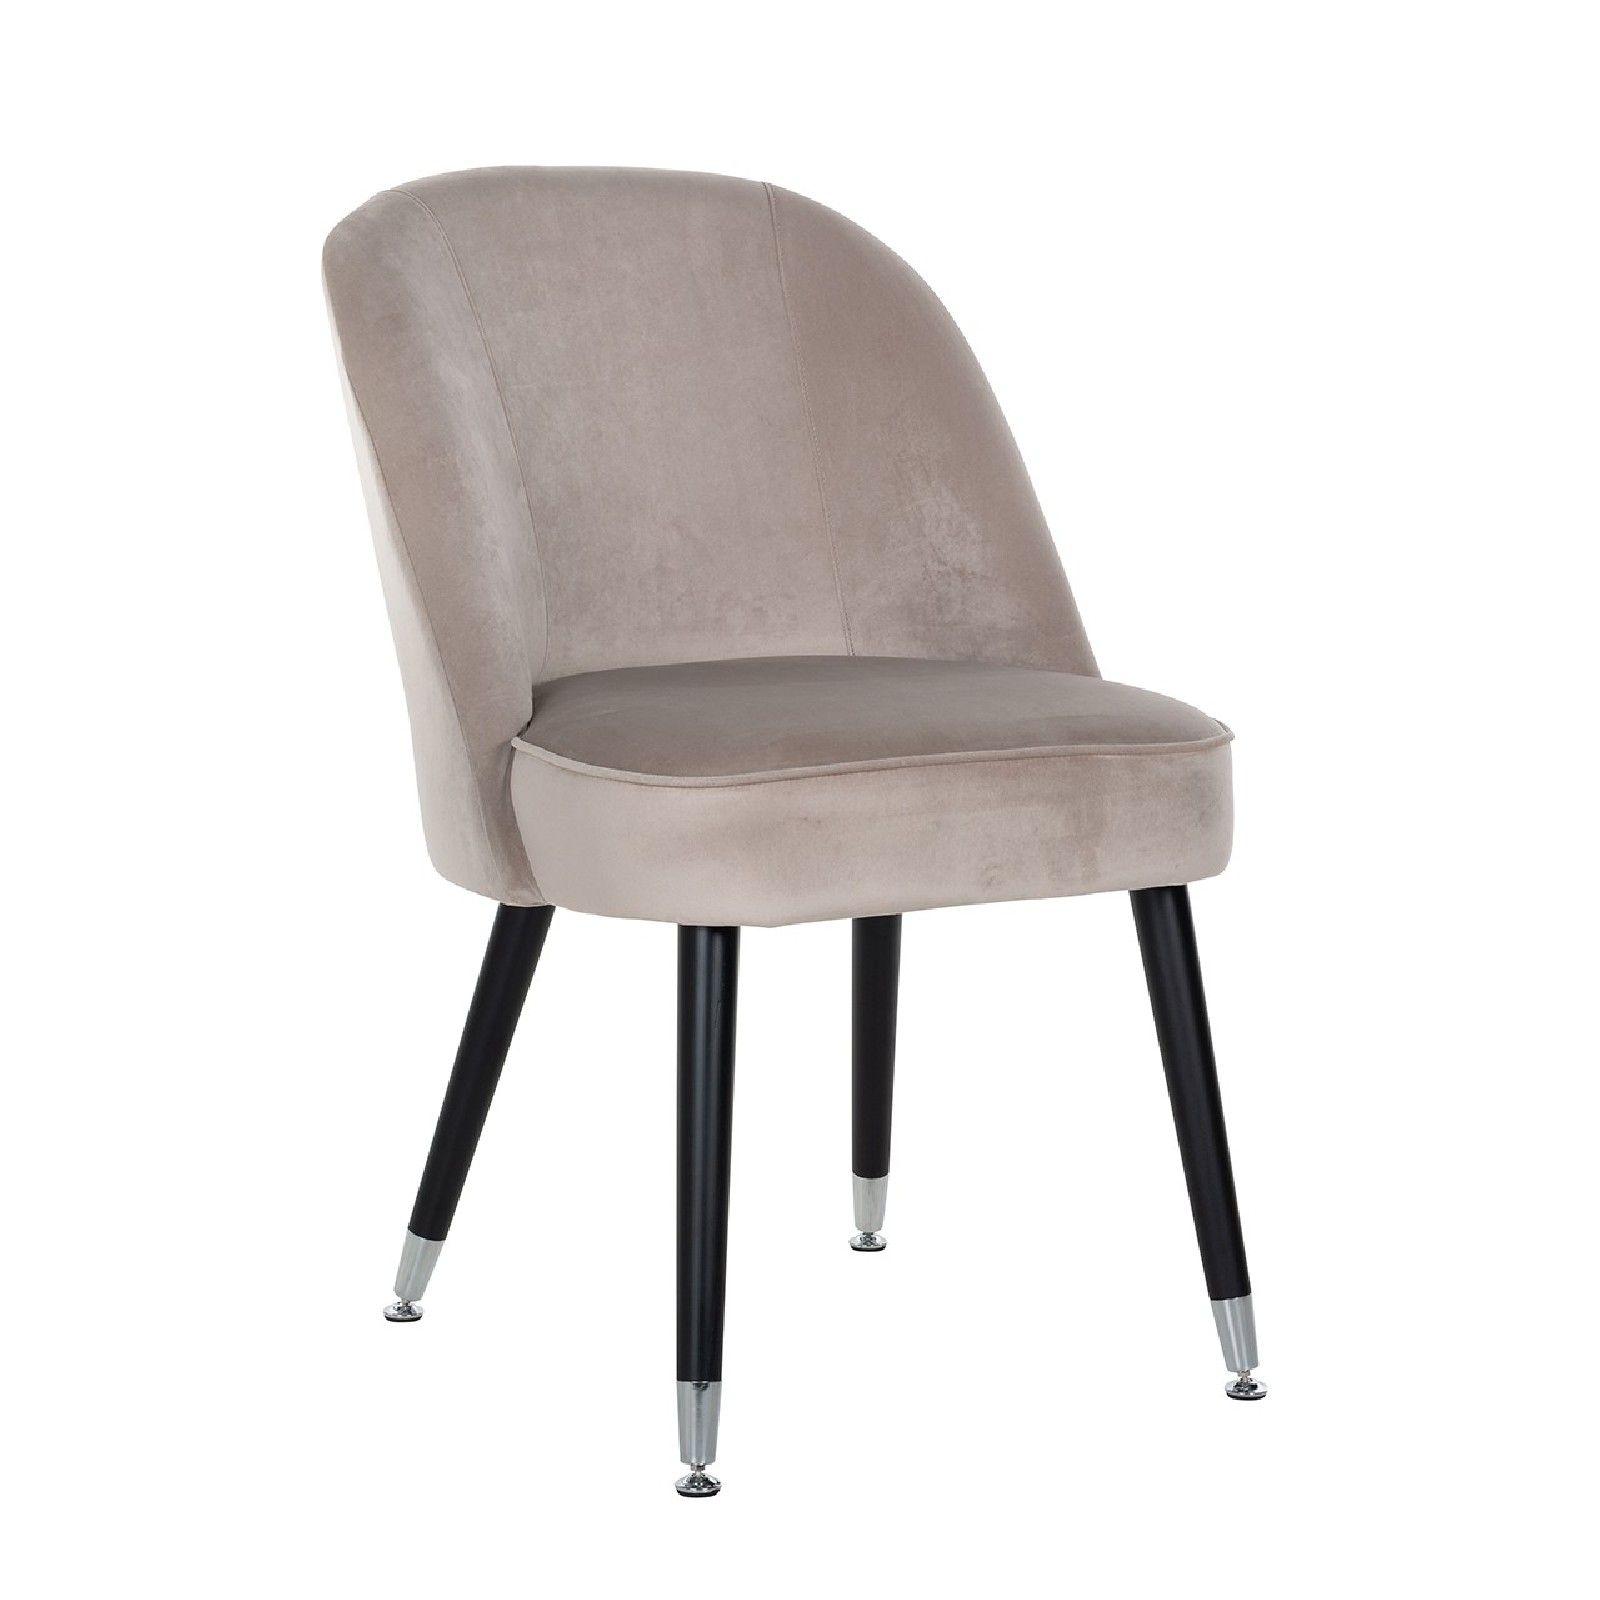 Chaise Julius Khaki Velvet, Silver footcap Salle à manger - 9